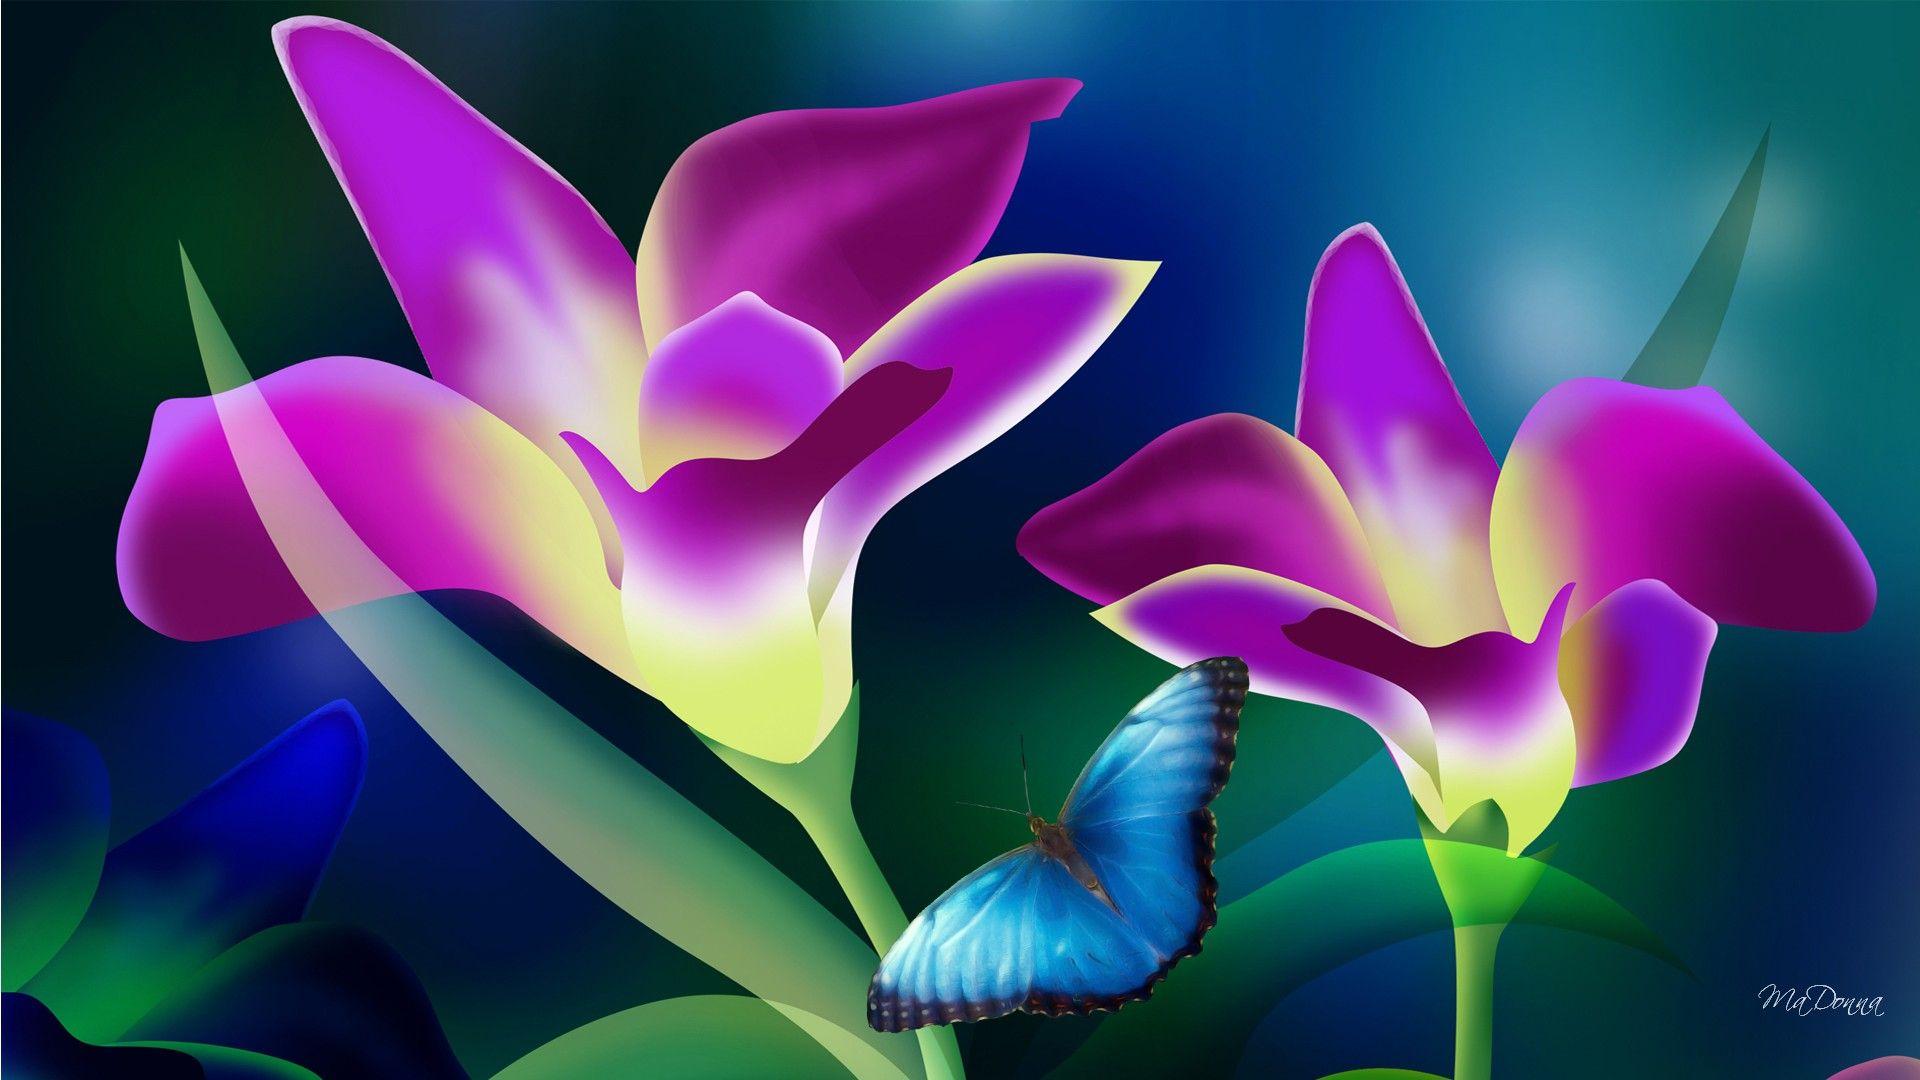 Tropical Flowers Wallpaper 1920x1080 42569